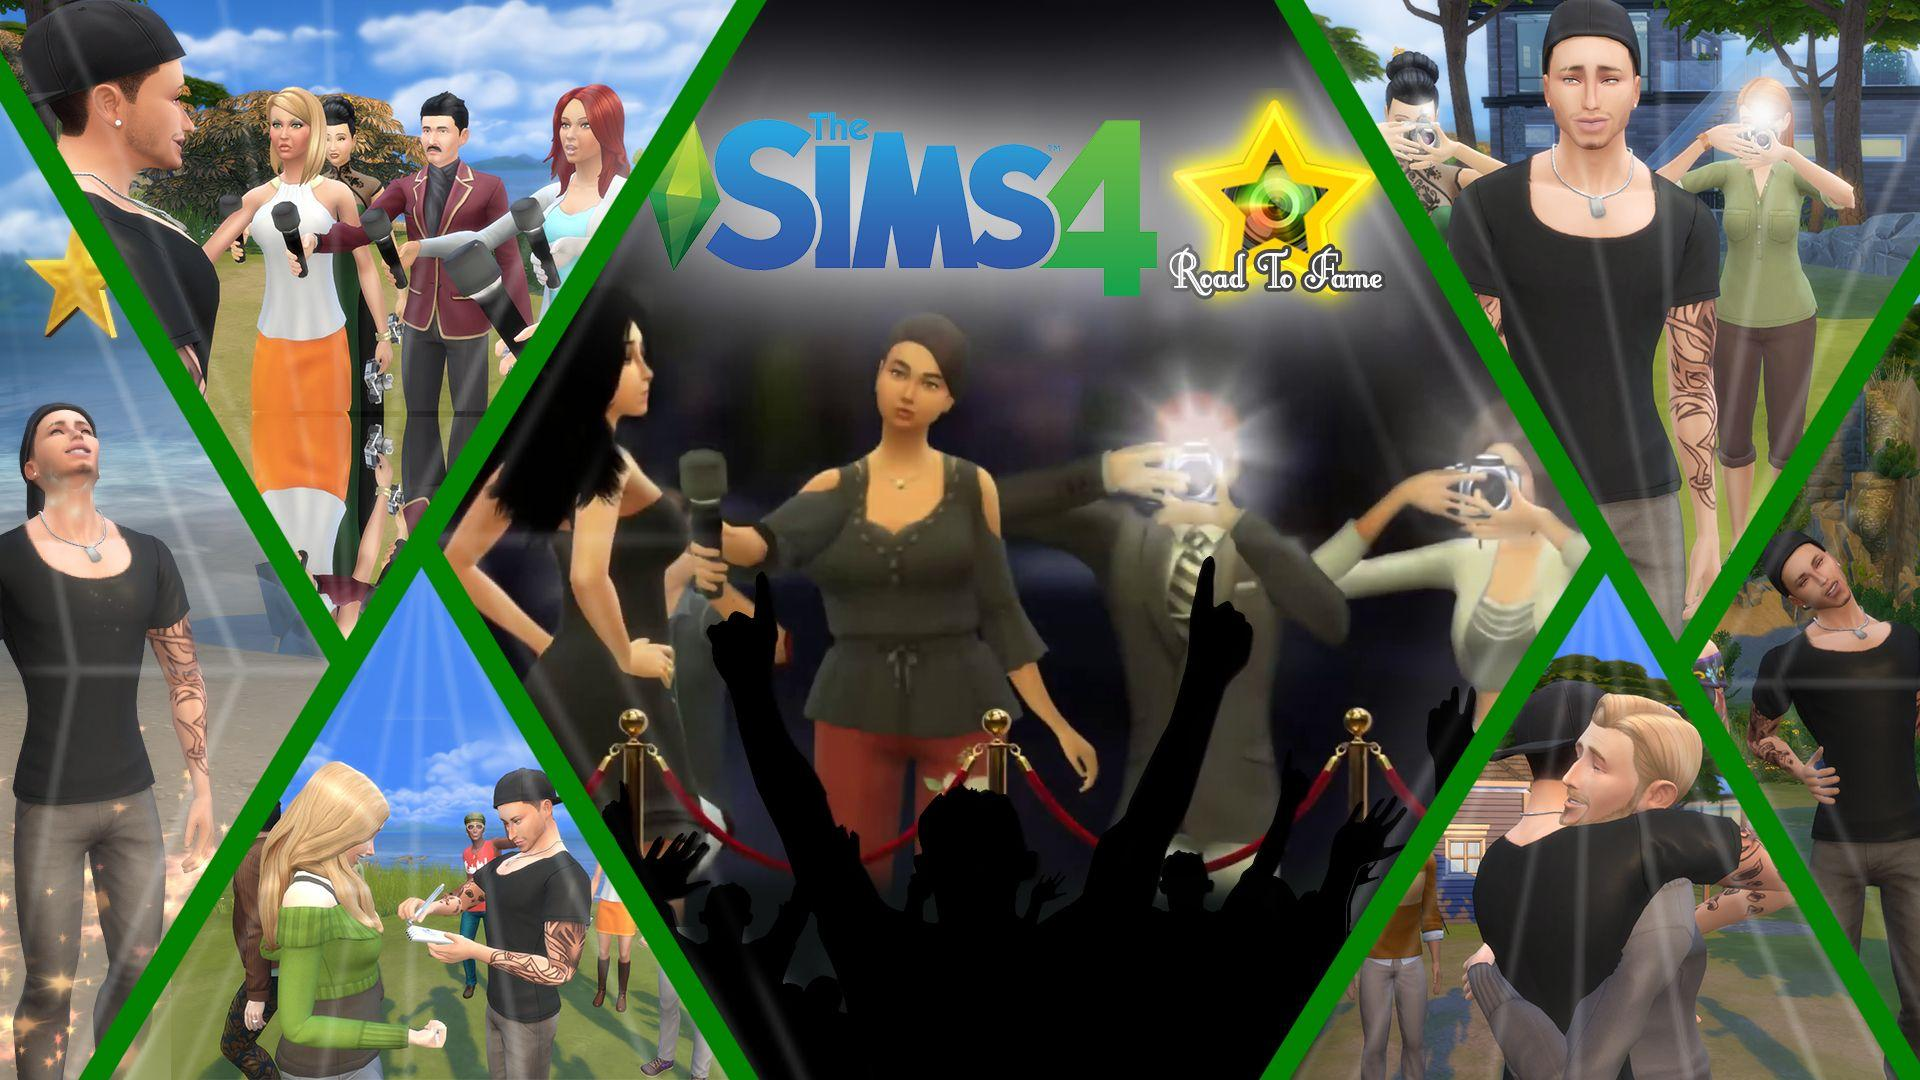 Мод: «Путь к славе» для The Sims 4